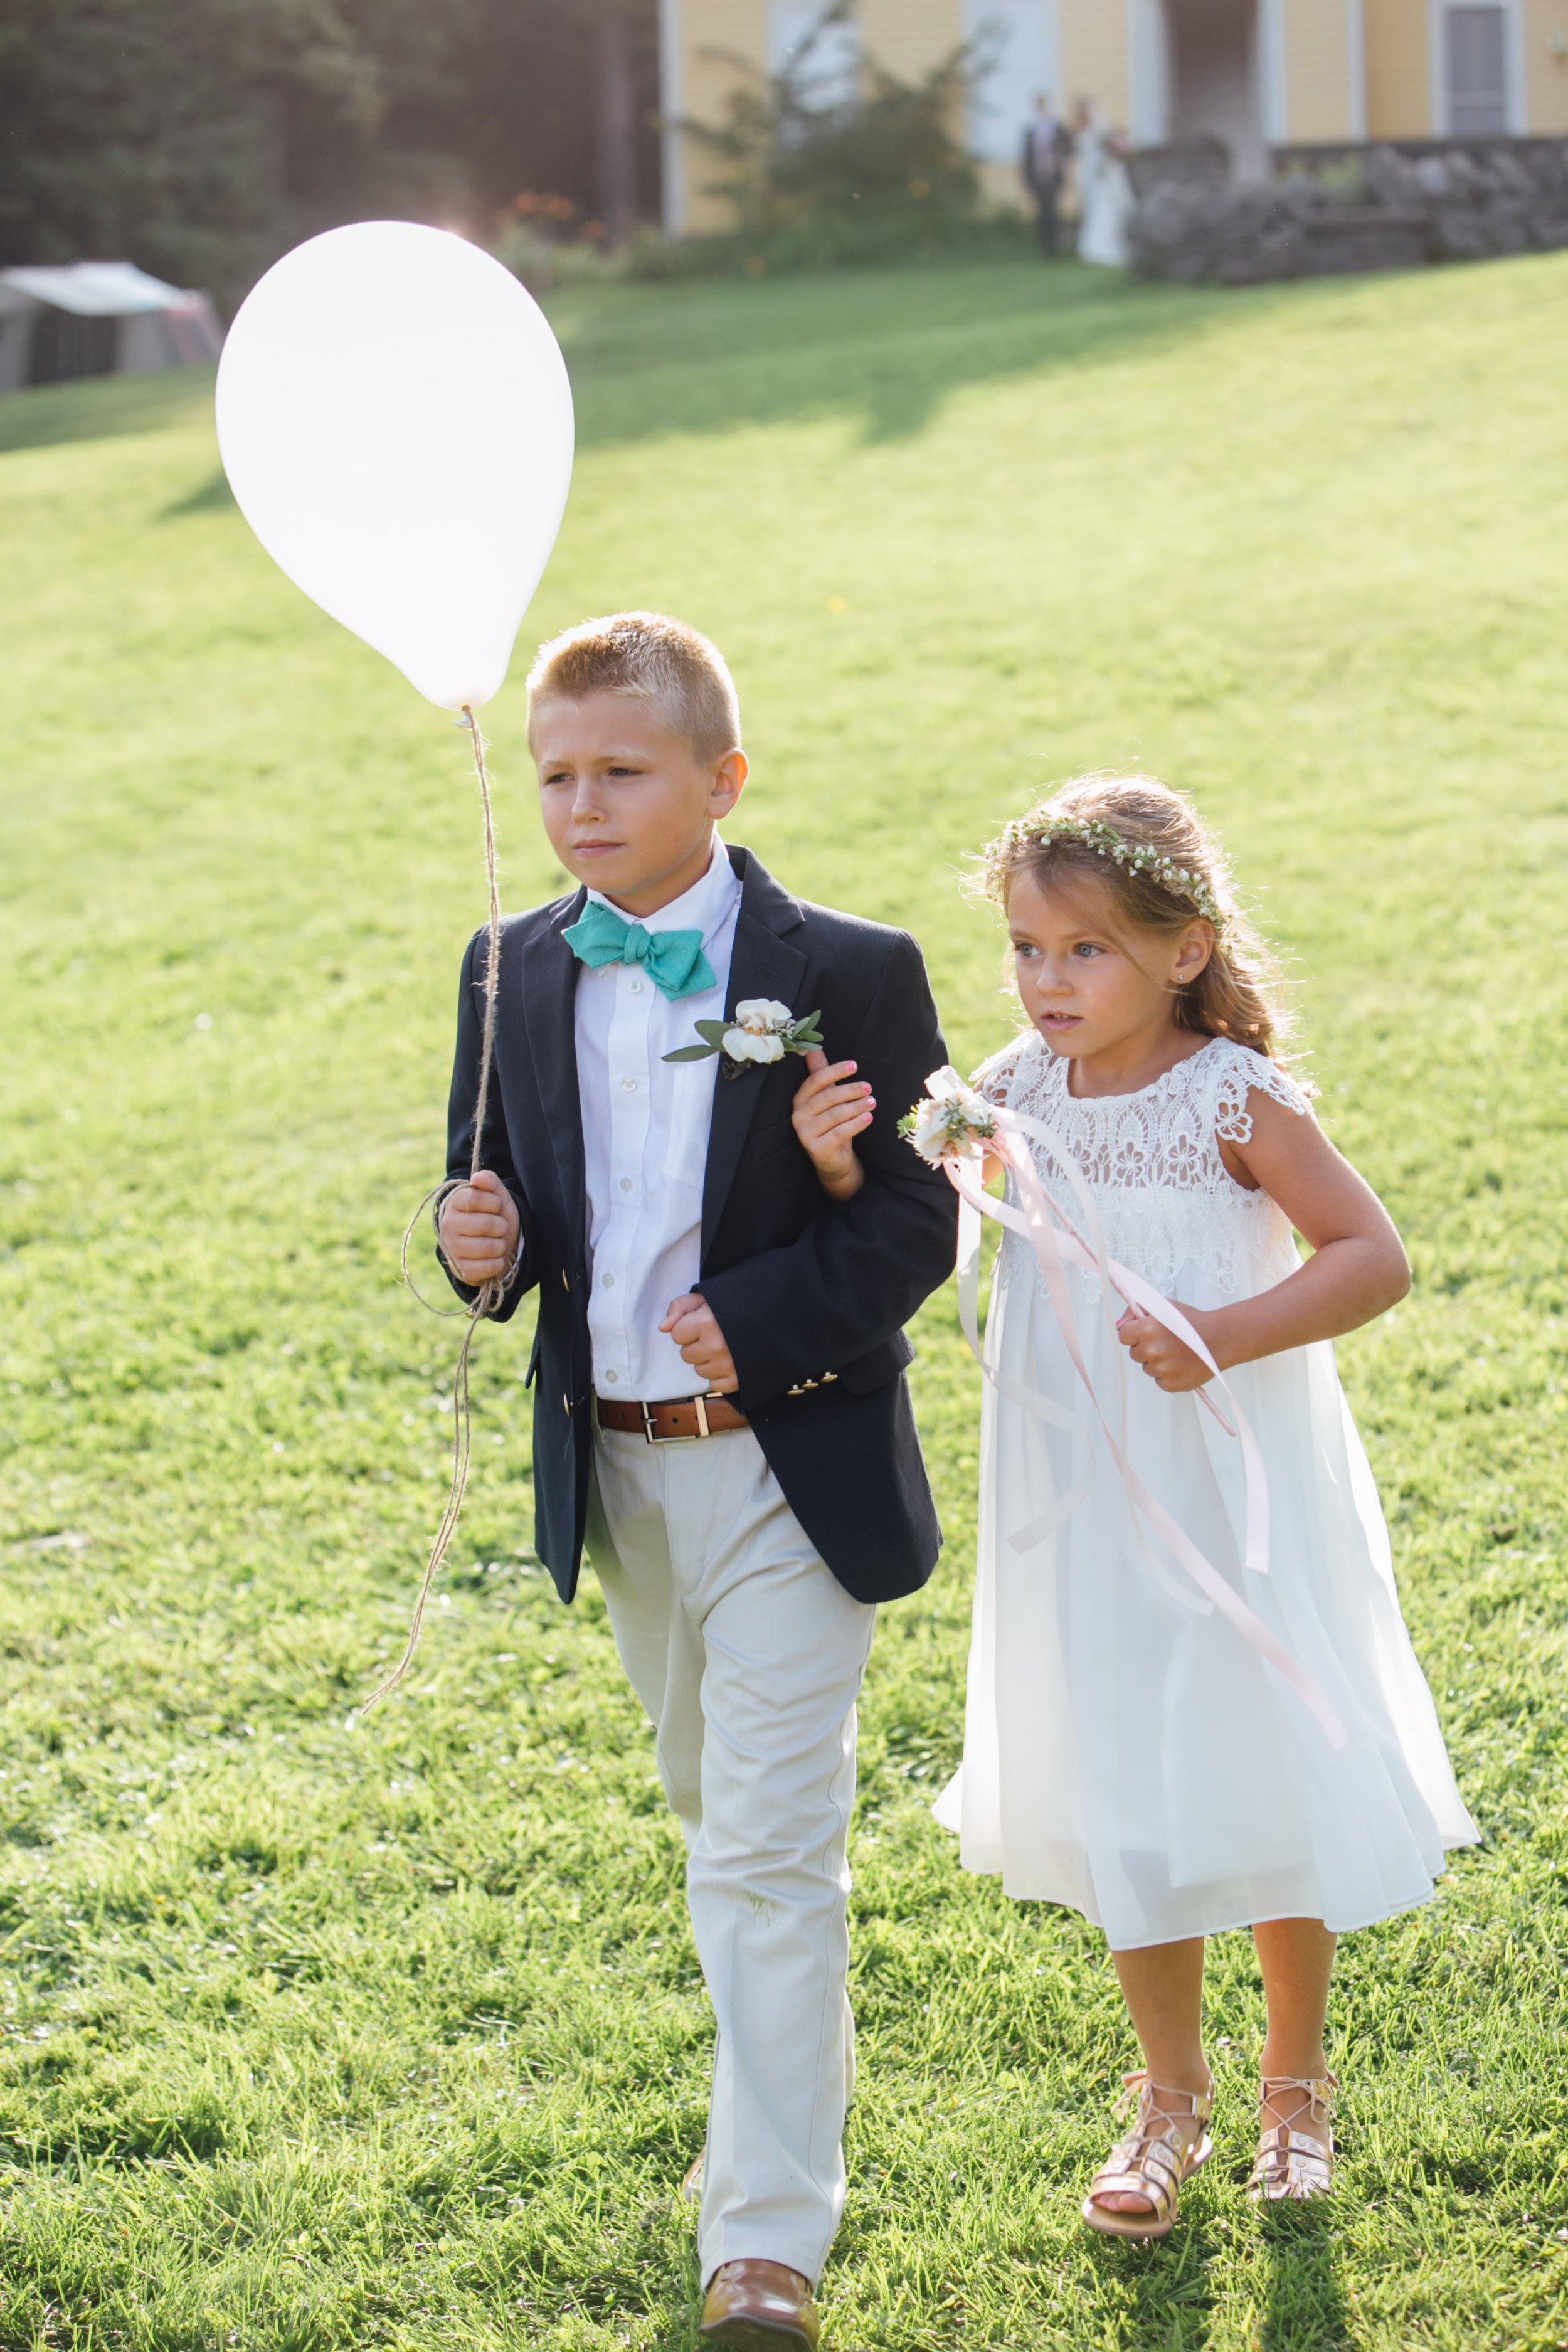 Courtney + Matt Blenheim Hill Farm Catskills NY Wedding Veronica Lola Photography 2017-368.jpg